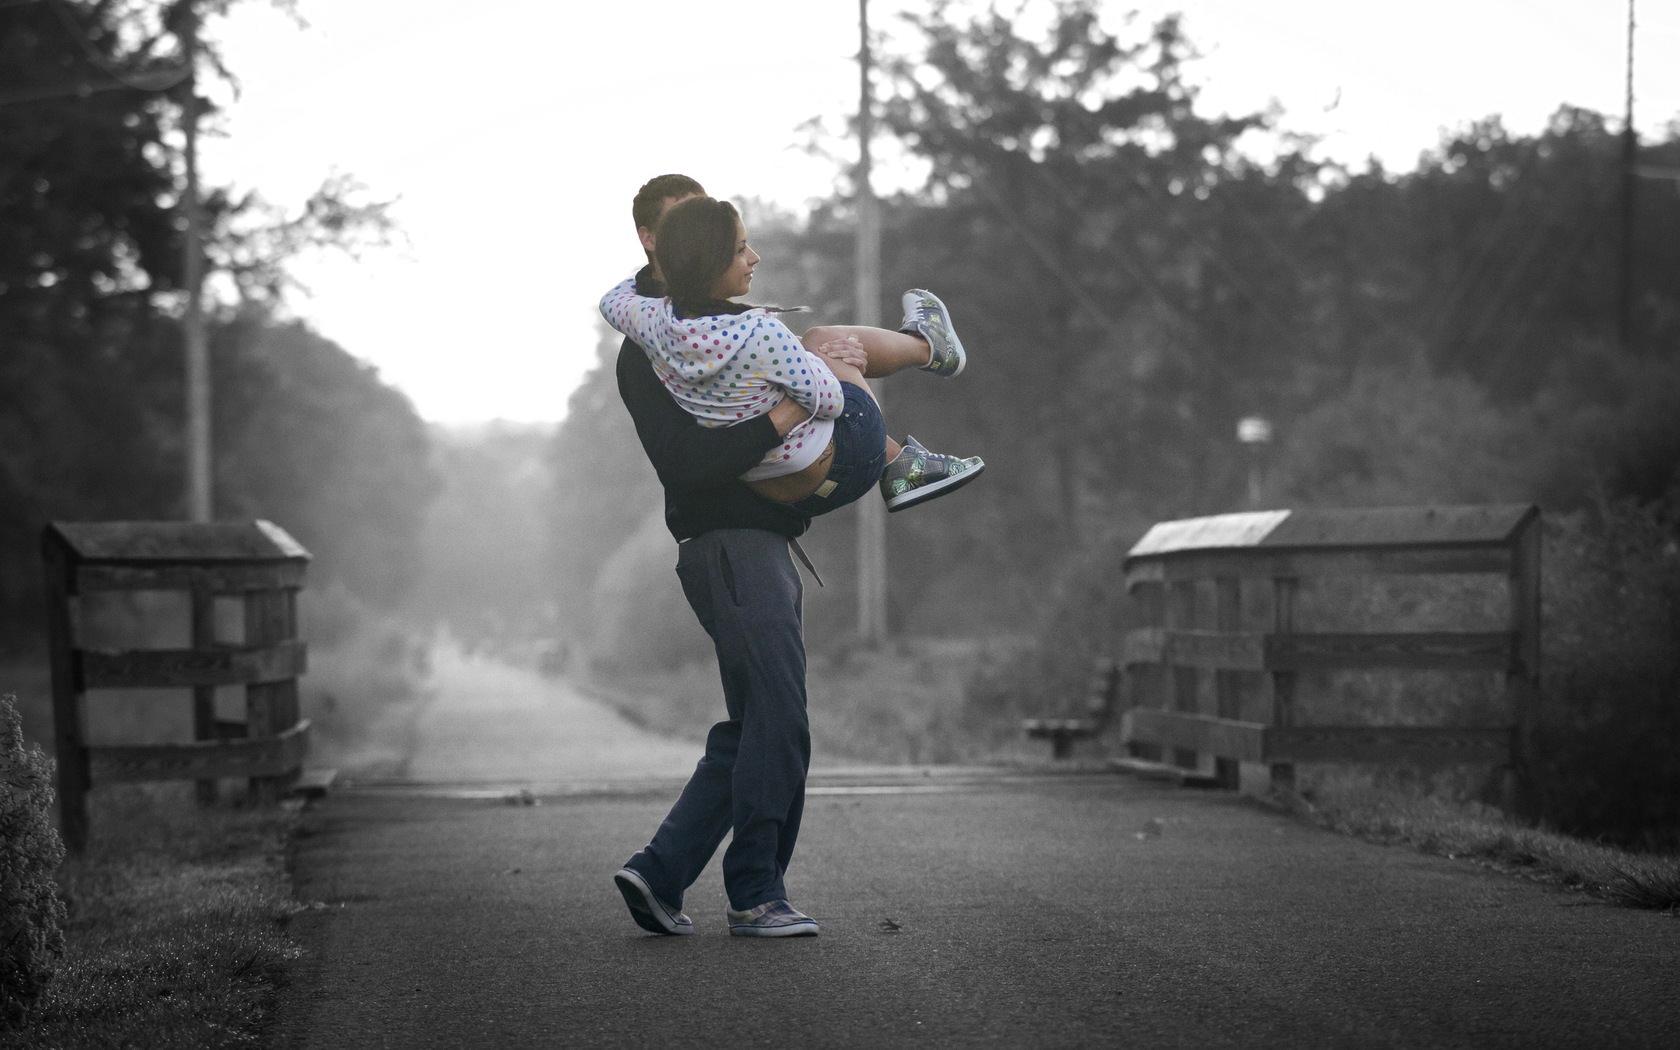 любовь, парень и девушка, девушку носят на руках